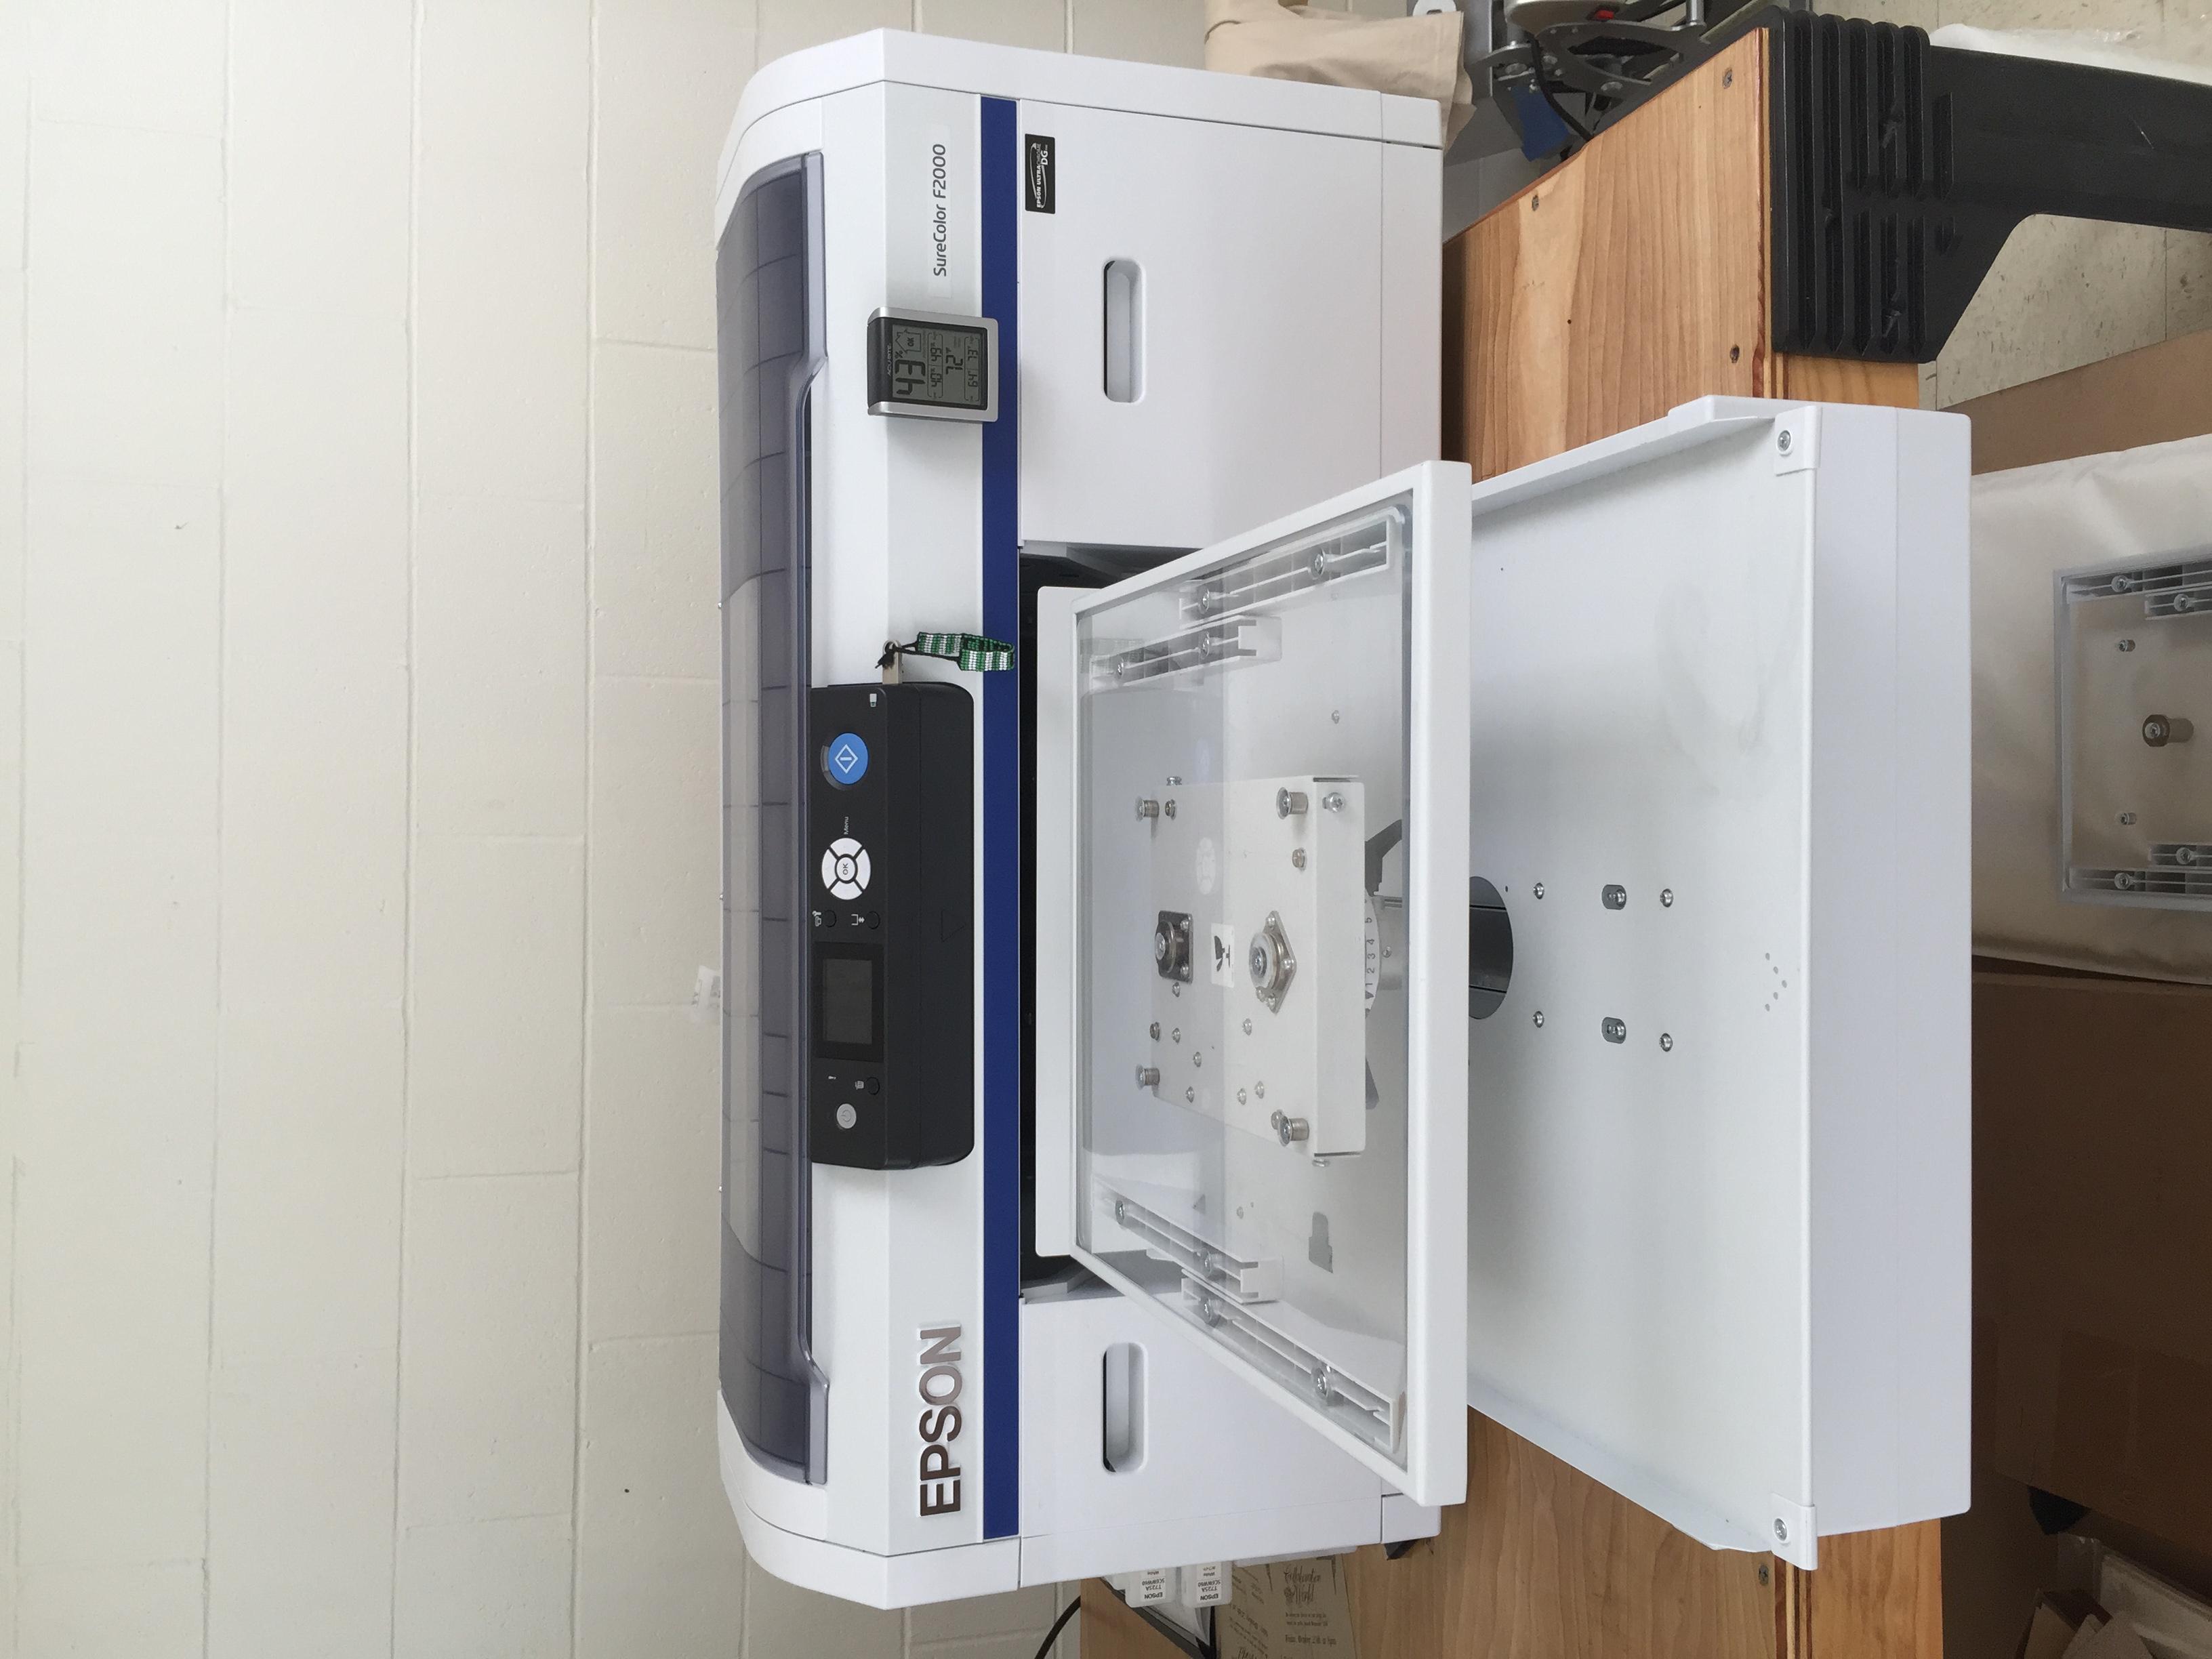 Epson F2000 Surecolor Direct To Garment Printer